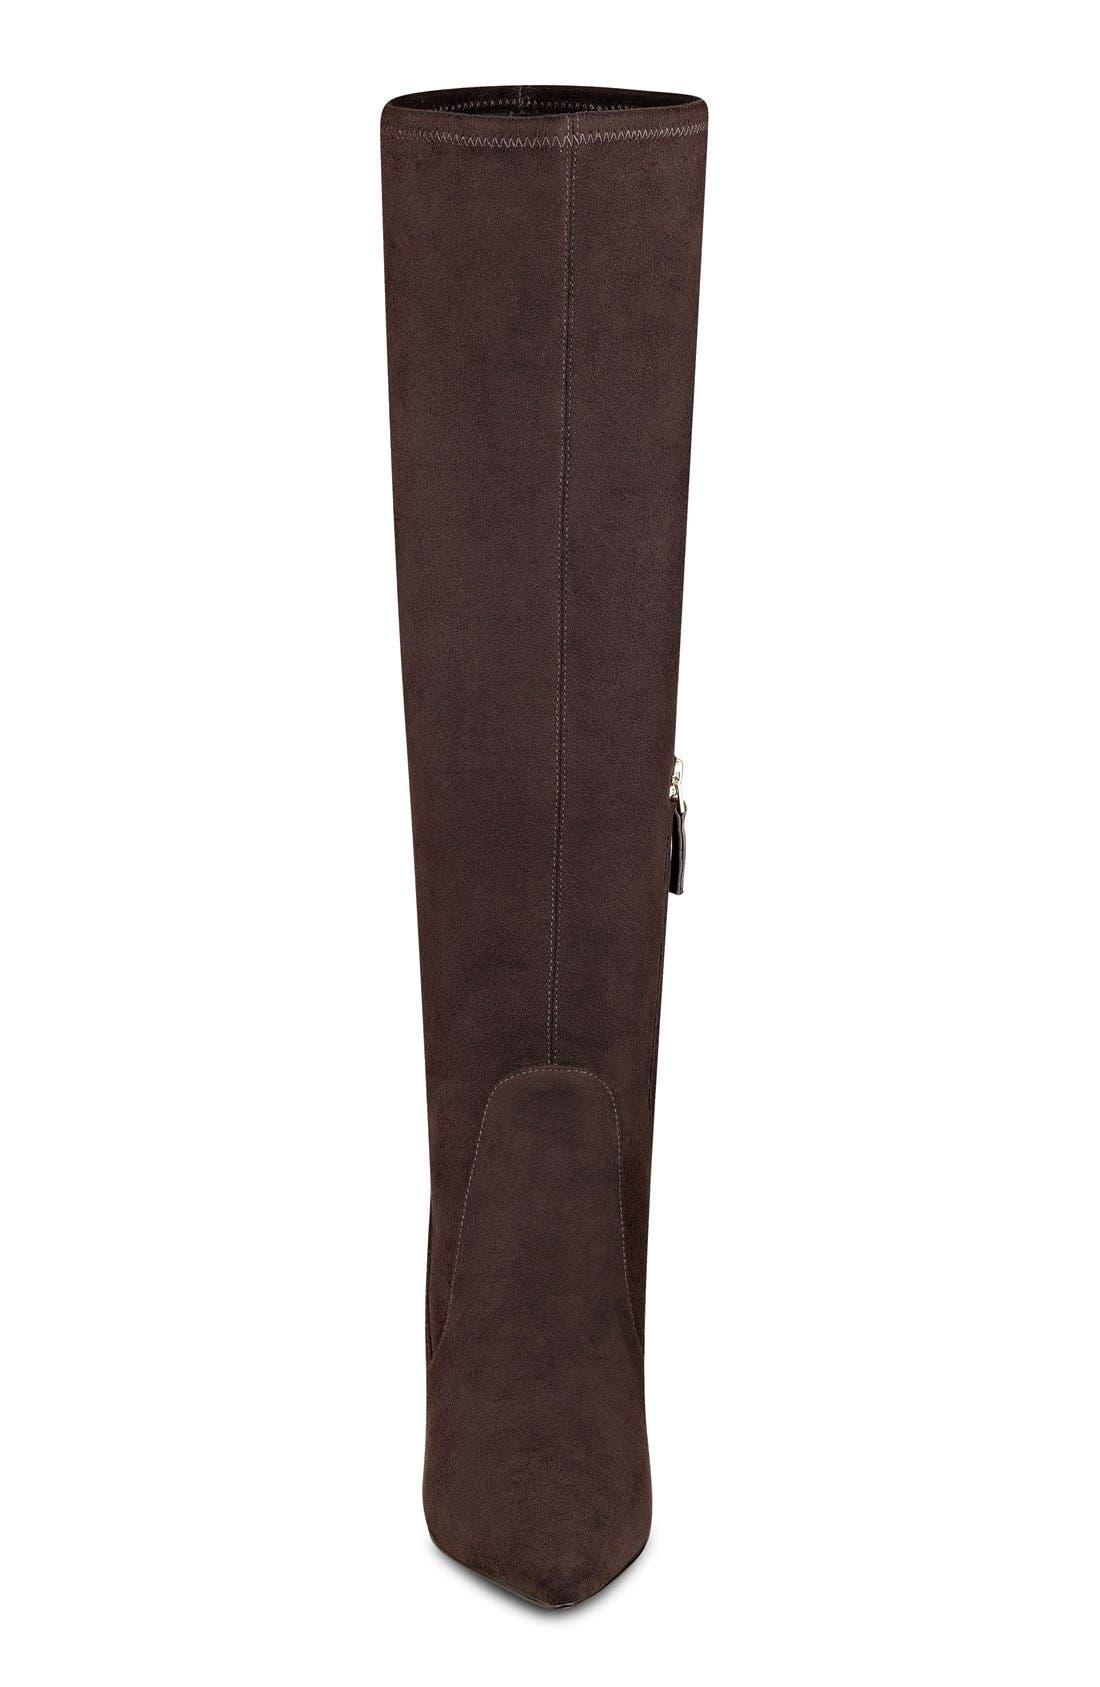 Alternate Image 3  - Nine West 'Calla' Knee-High Boot (Women)